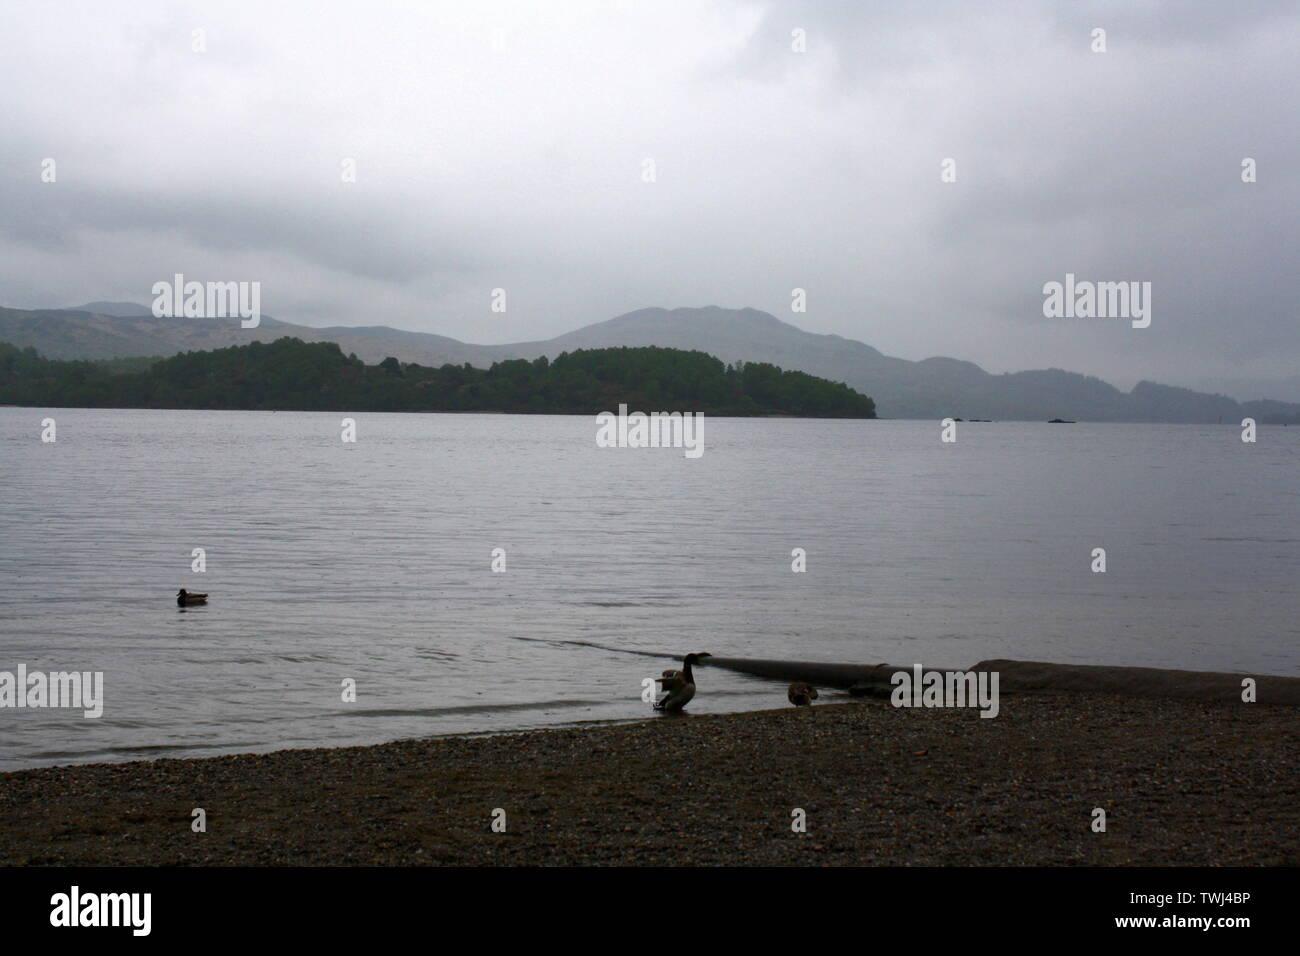 Landscape/seascape of ducks on the coast of Loch Lomond, Scotland, United Kingdom - Stock Image